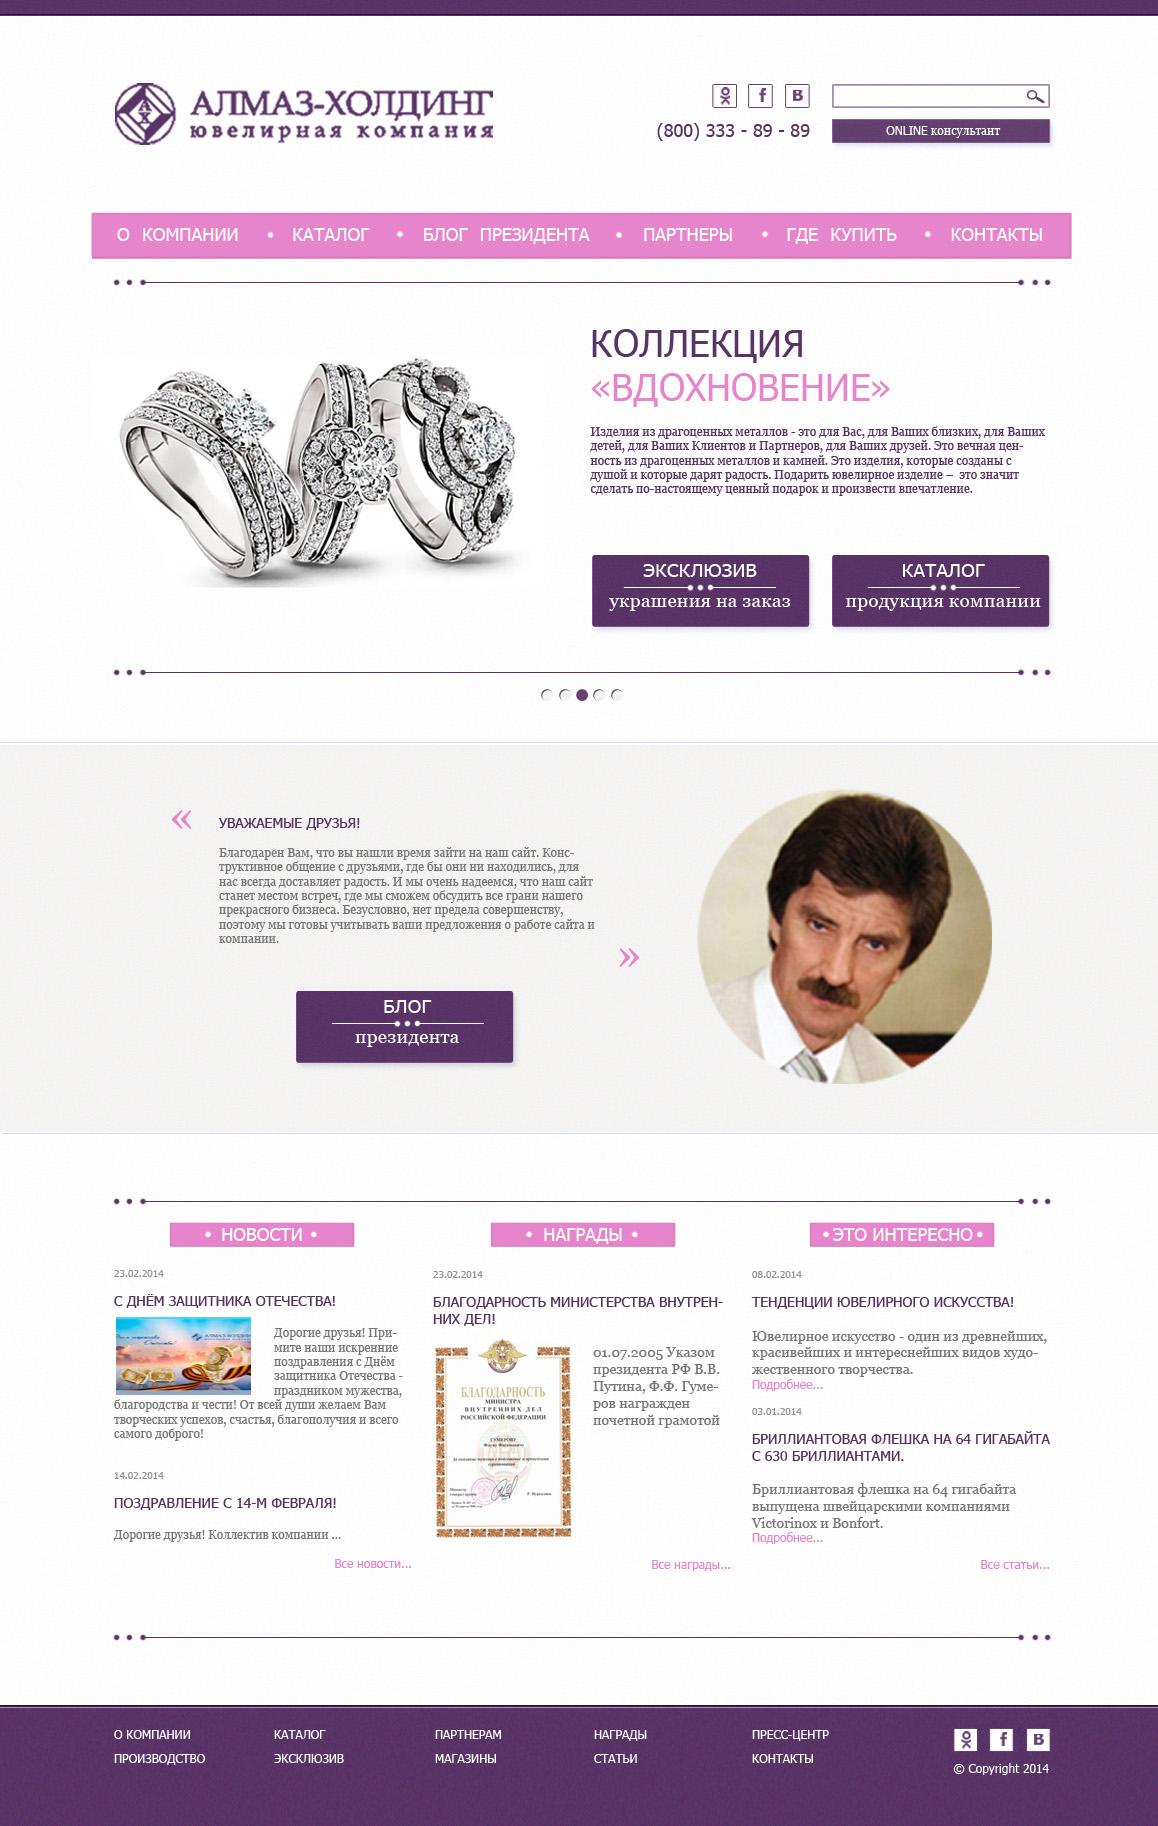 Дизайн сайта для ювелирной компании Алмаз-Холдинг фото f_644530c6e94e2852.jpg